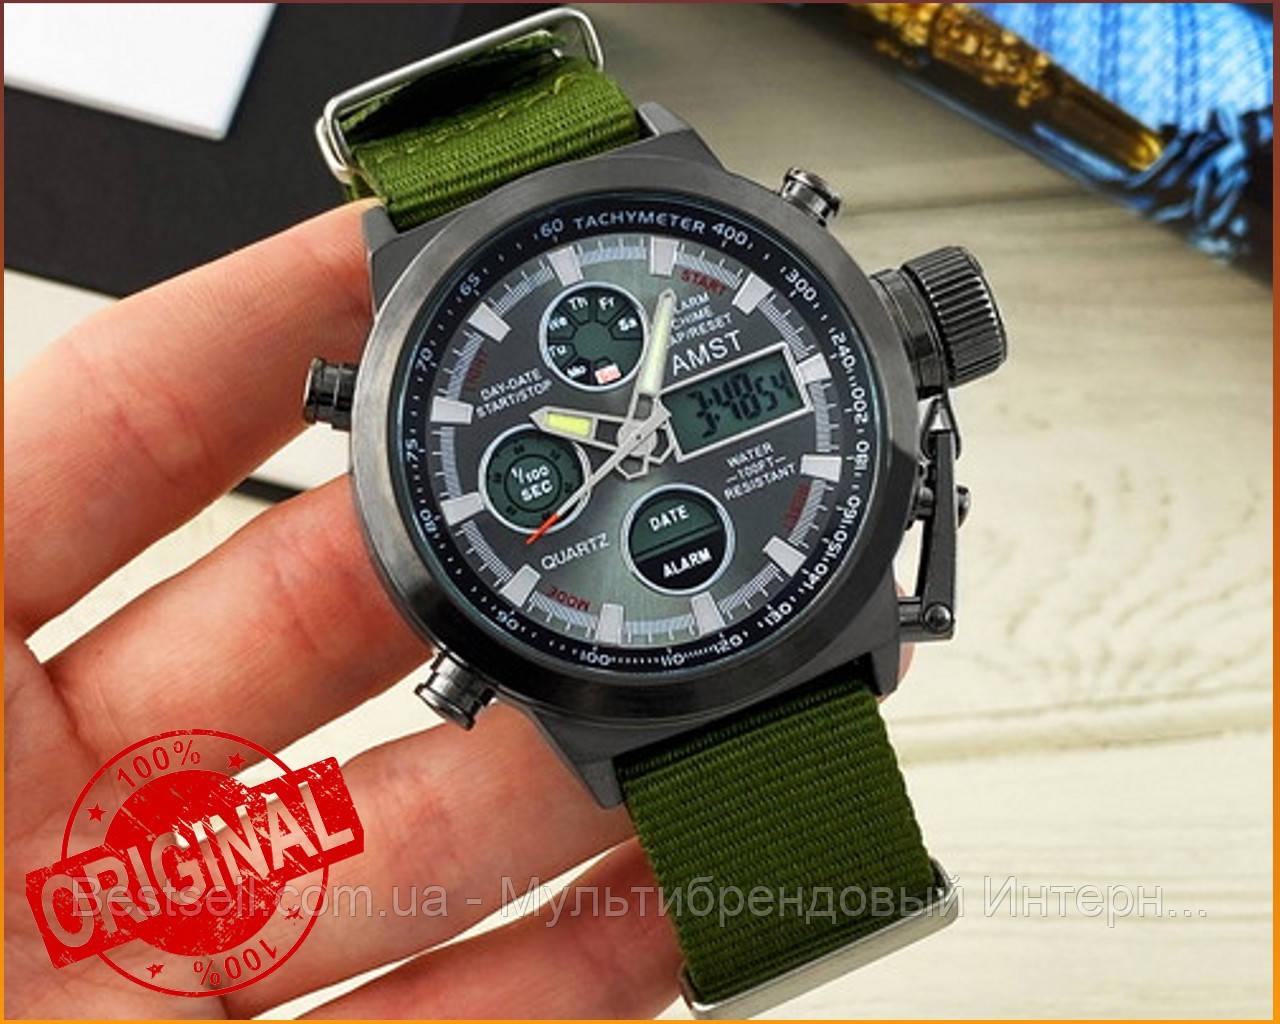 Оригинальные мужские часы AMST 3003 Black-Black Green Wristband